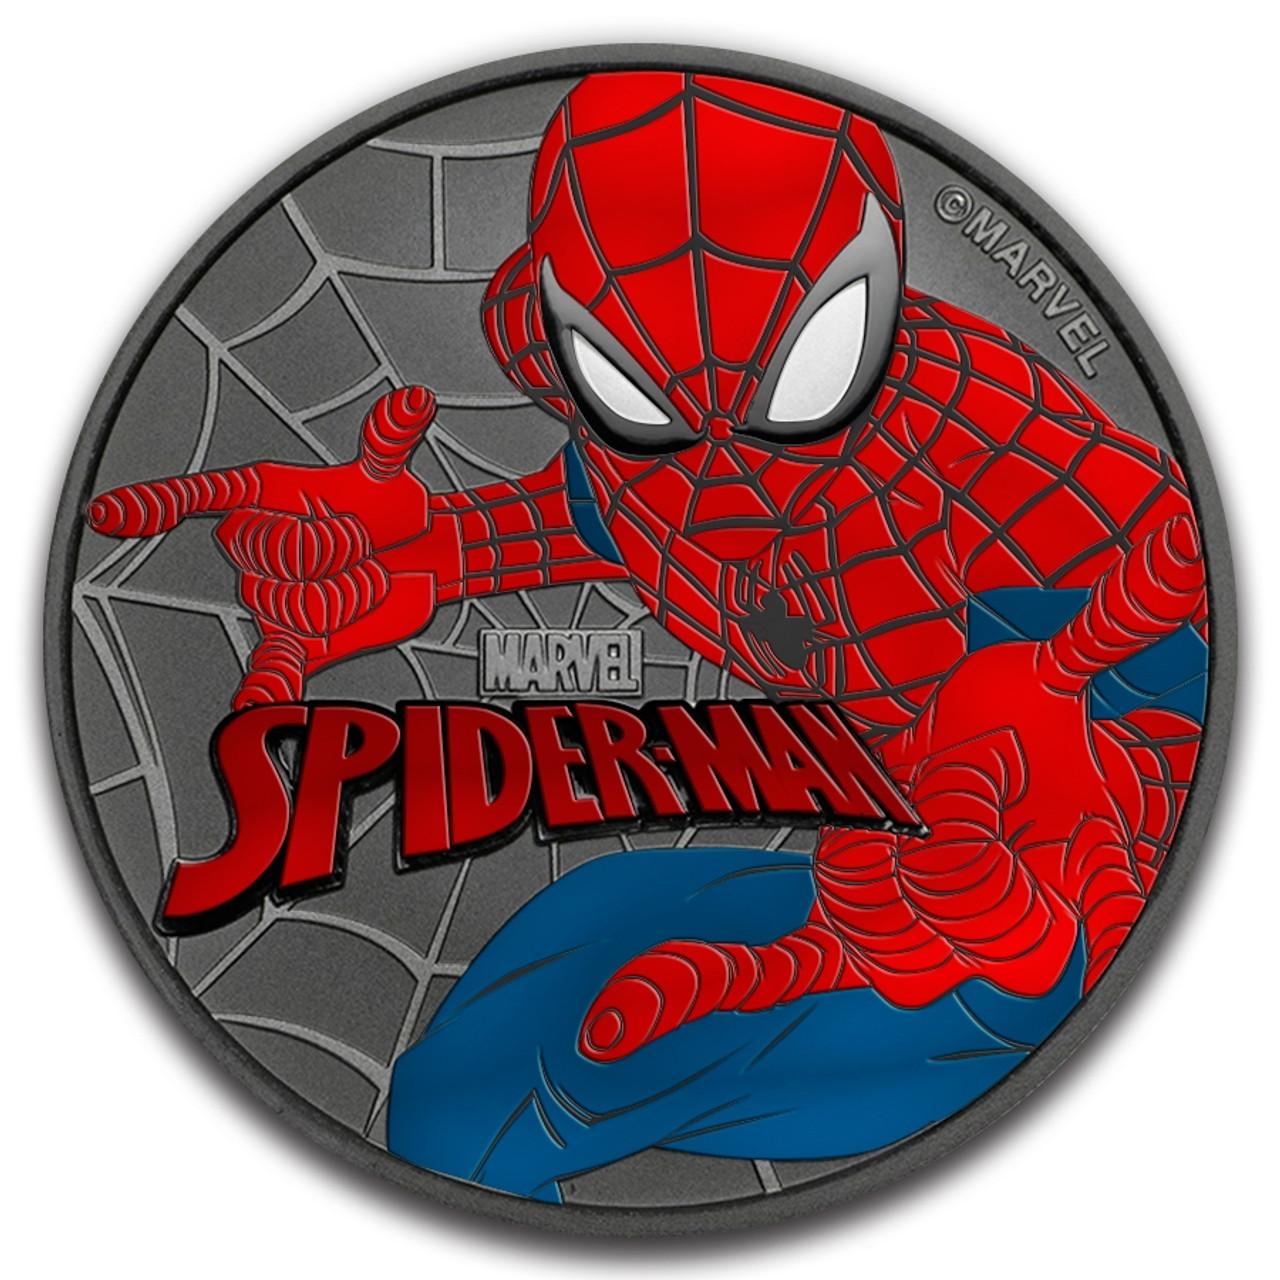 Spider-Man American Silver Eagle 1oz .999 Silver Dollar Spiderman Coin